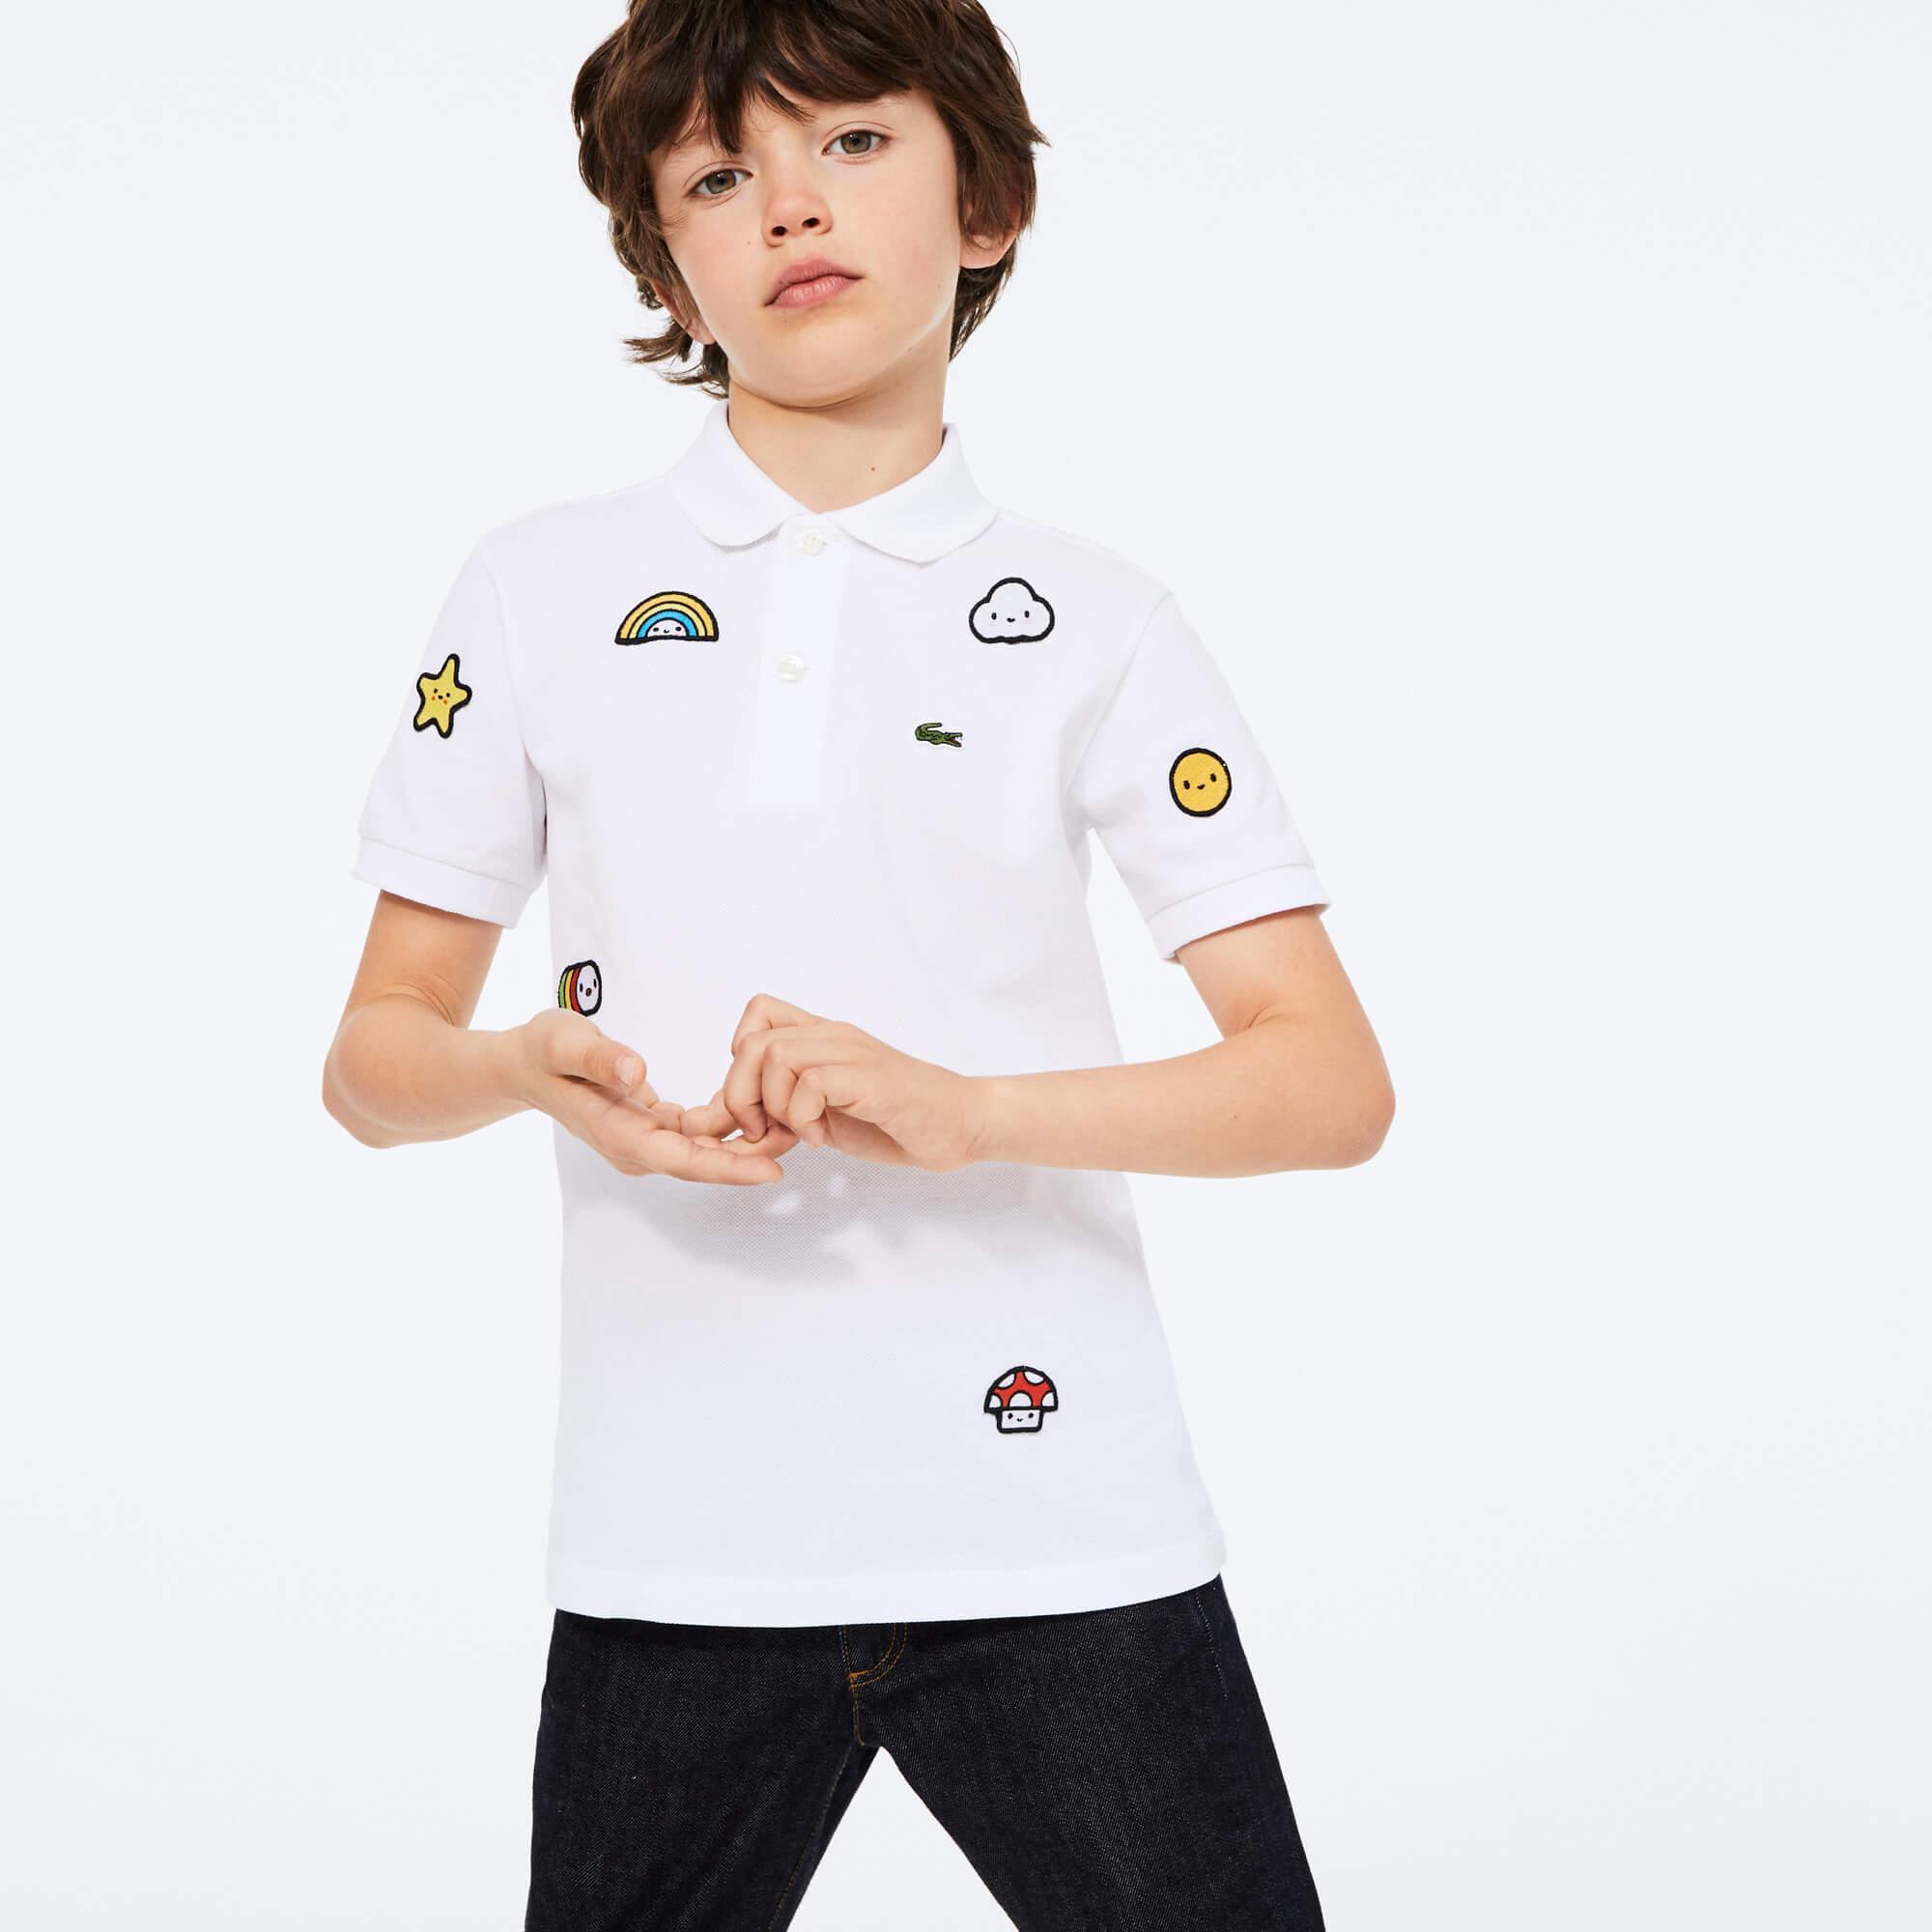 Lacoste X FriendsWithYou Çocuk Desenli Beyaz Polo